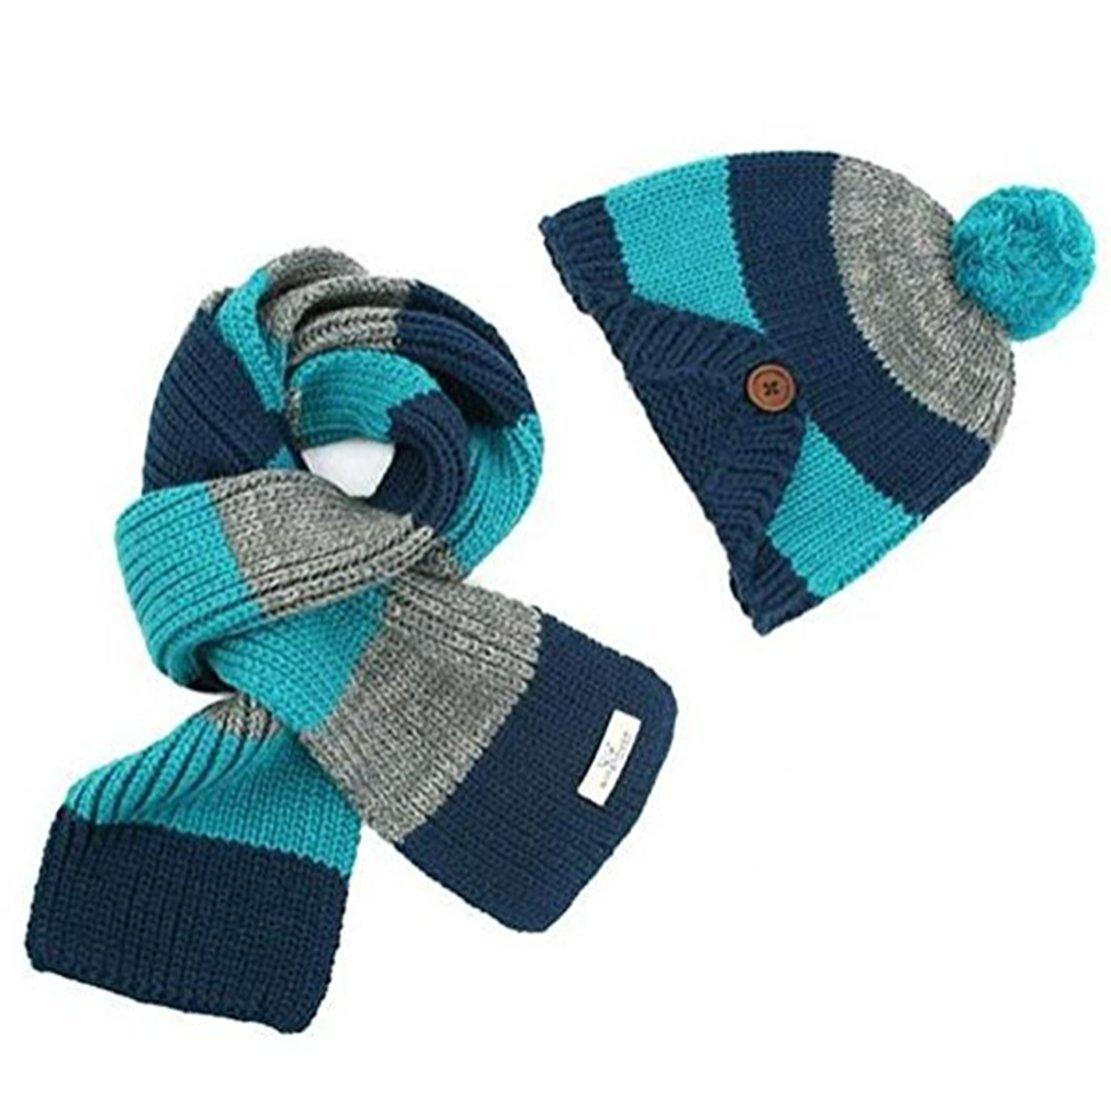 Freedi Winter Kids Boys Knitted Woolen Stripe Hat and Scarf Set Wcn541 Blue WCN541L//FDUS